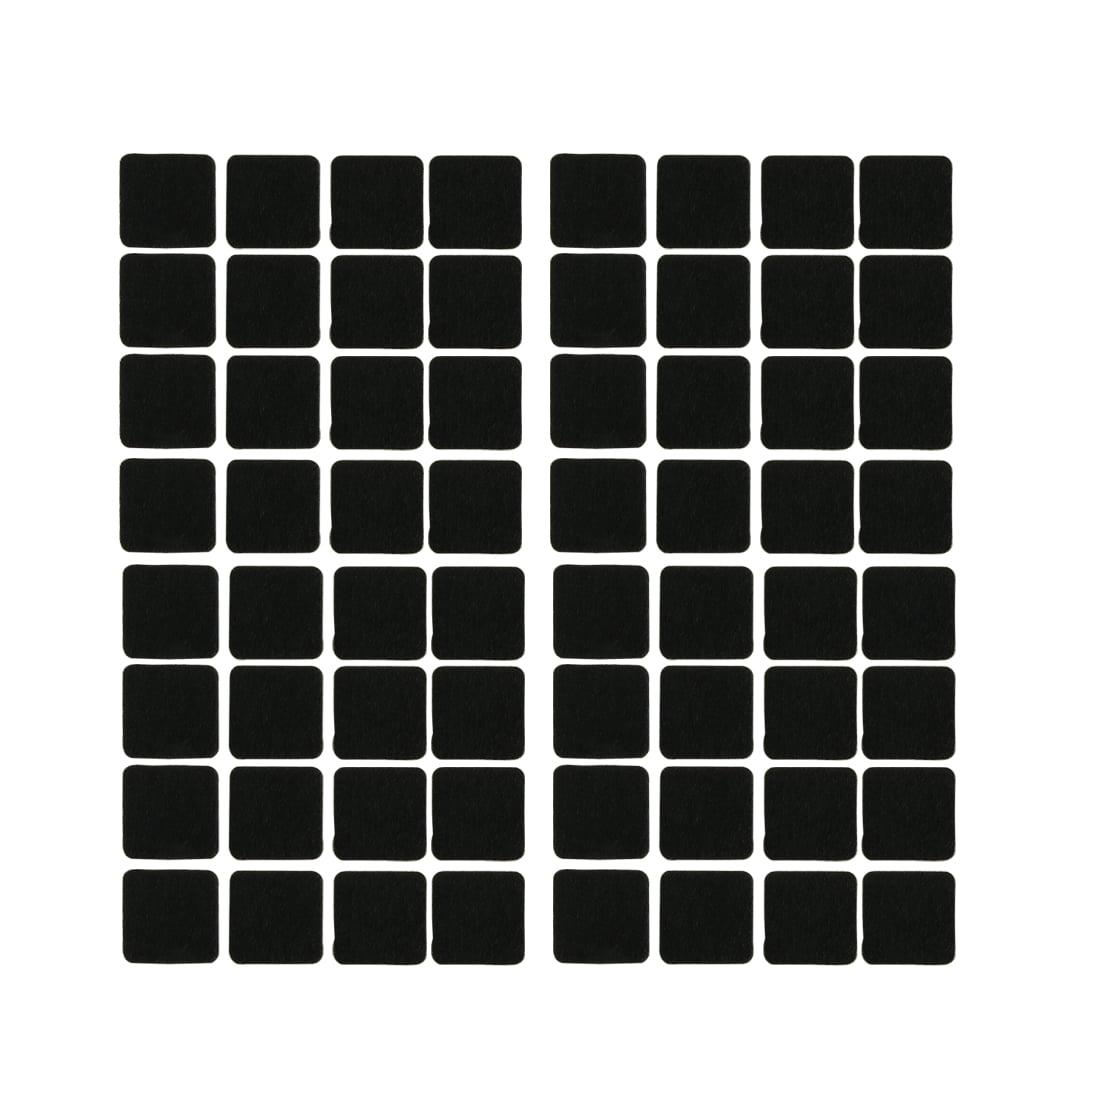 Furniture Rubber Square Feet Antiskid Adhesive Pad Floor Protector Black 64pcs - image 3 of 3